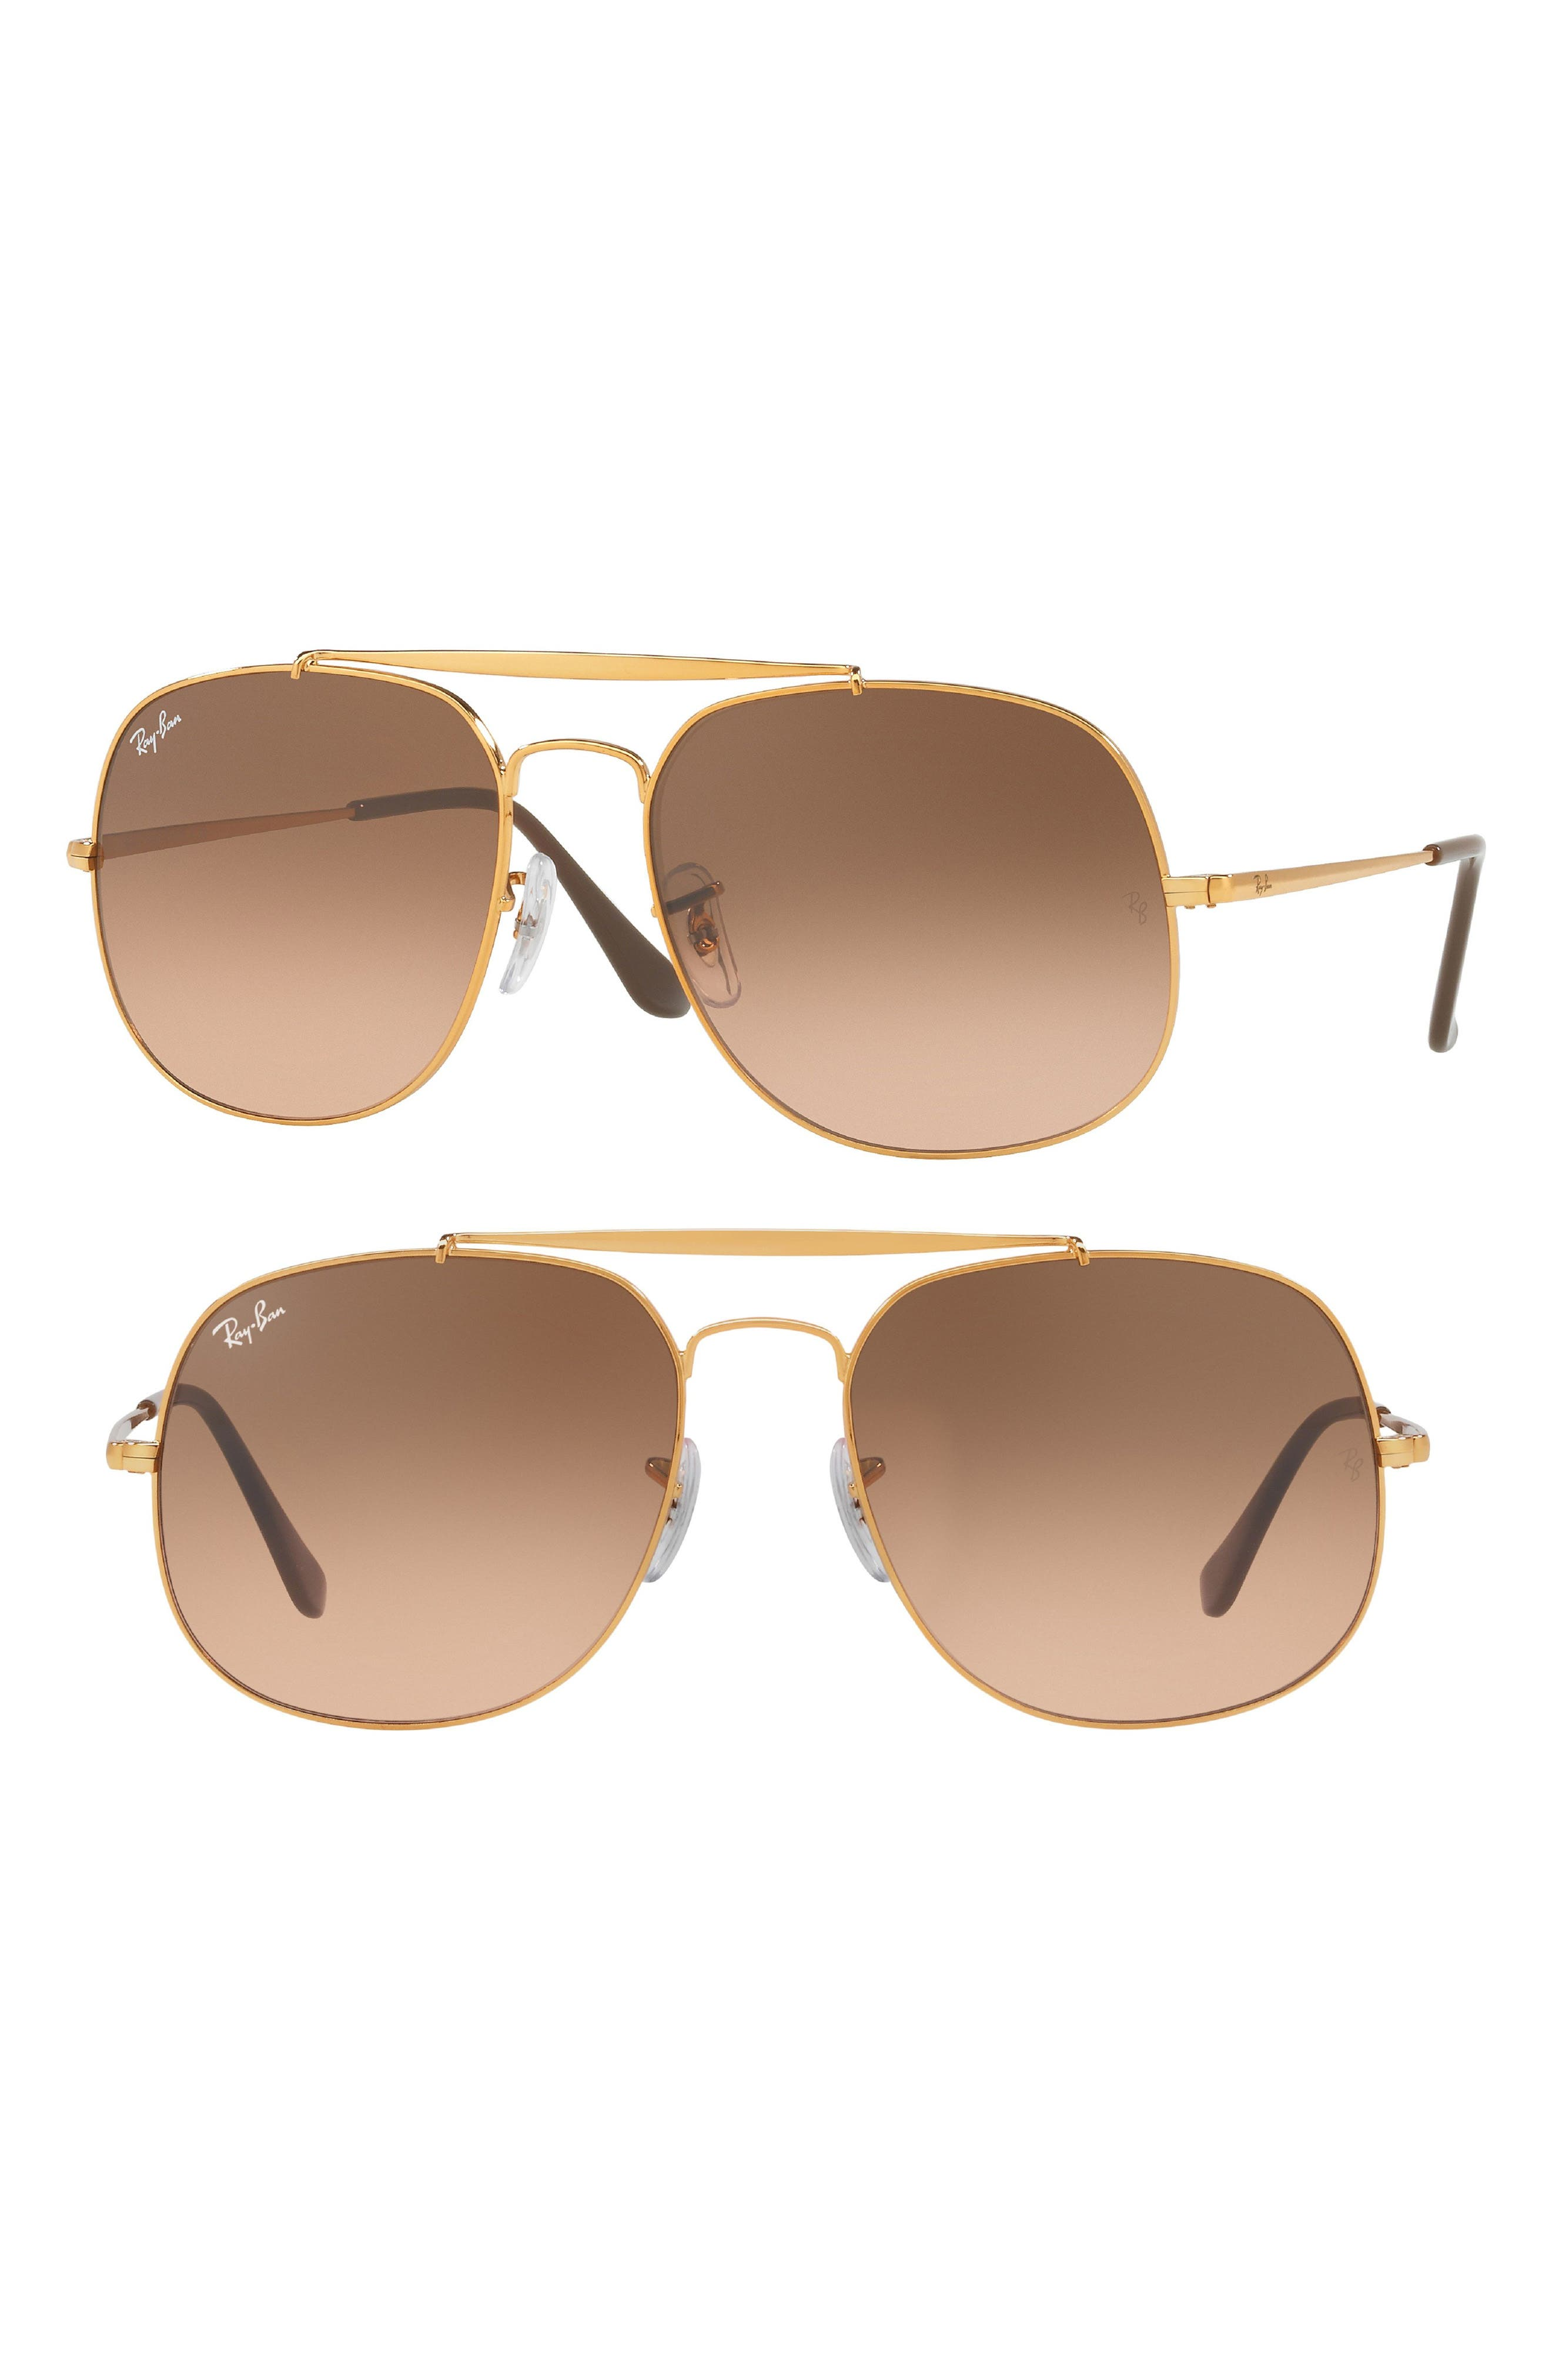 57mm Gradient Lens Square Aviator Sunglasses,                         Main,                         color,